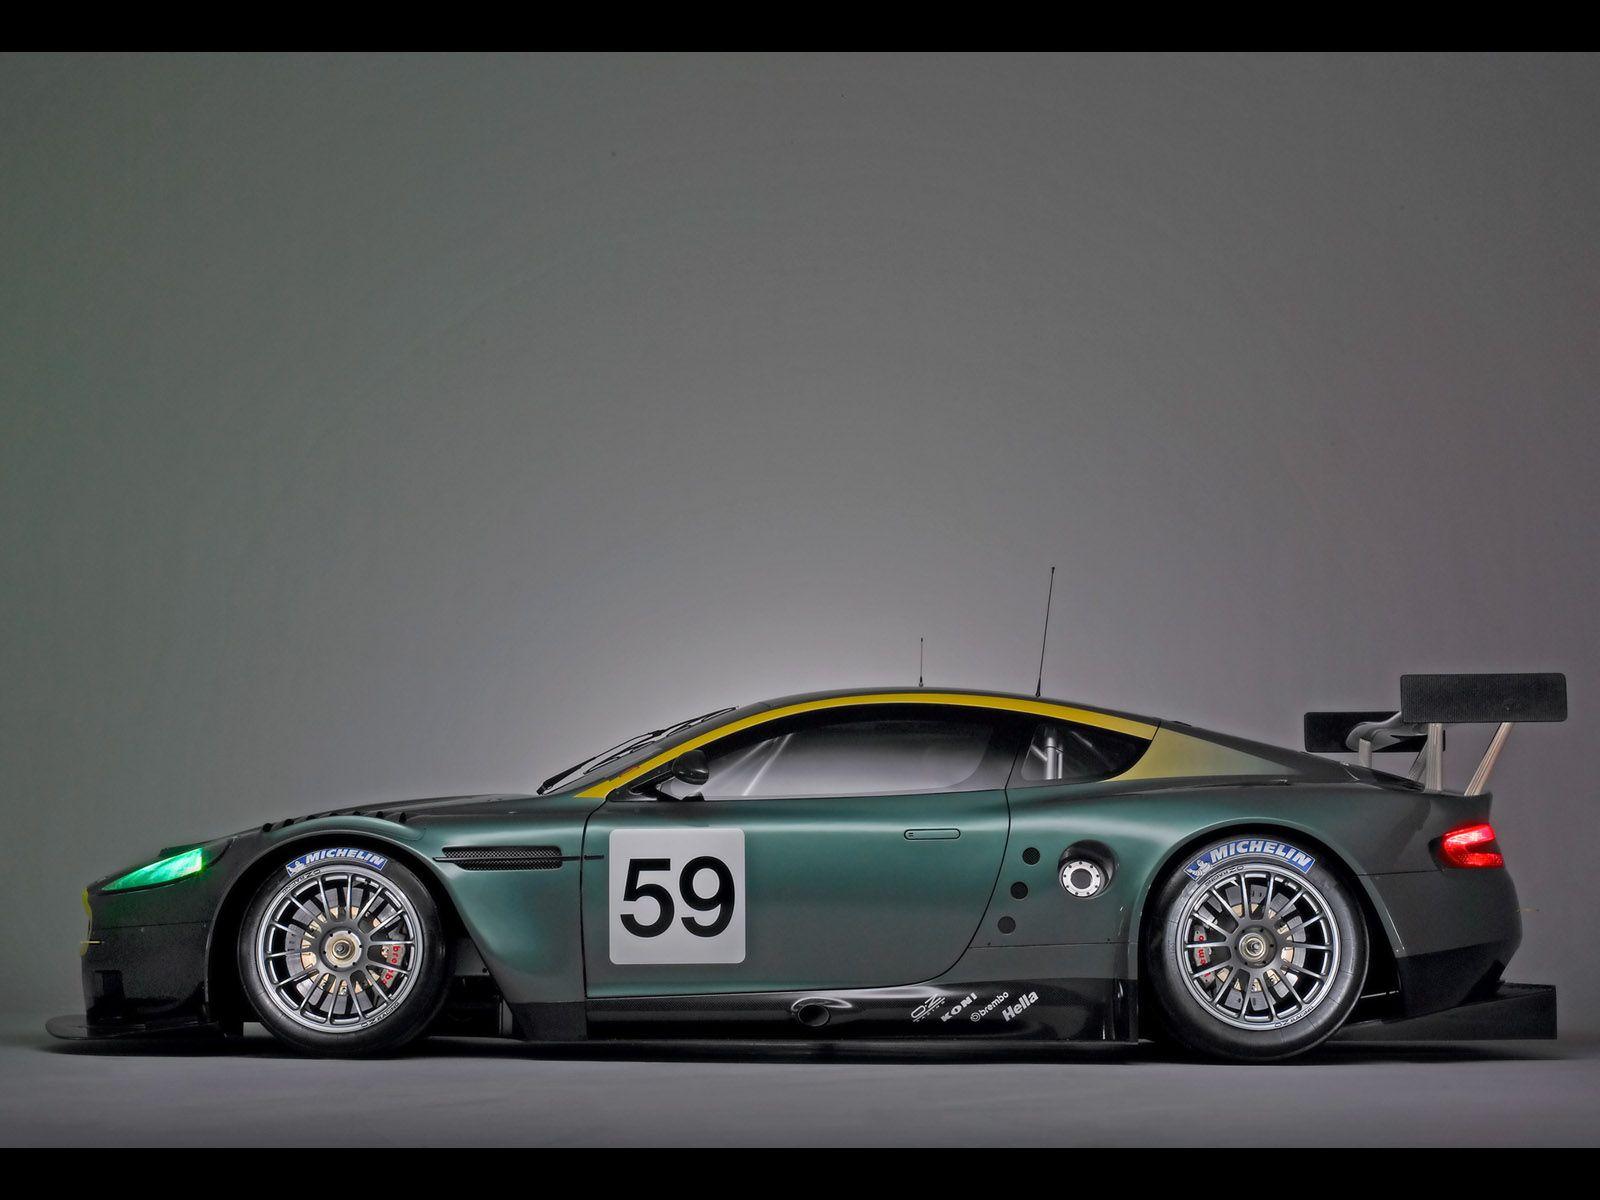 Aston Martin Dbr9 Aston Martin Car